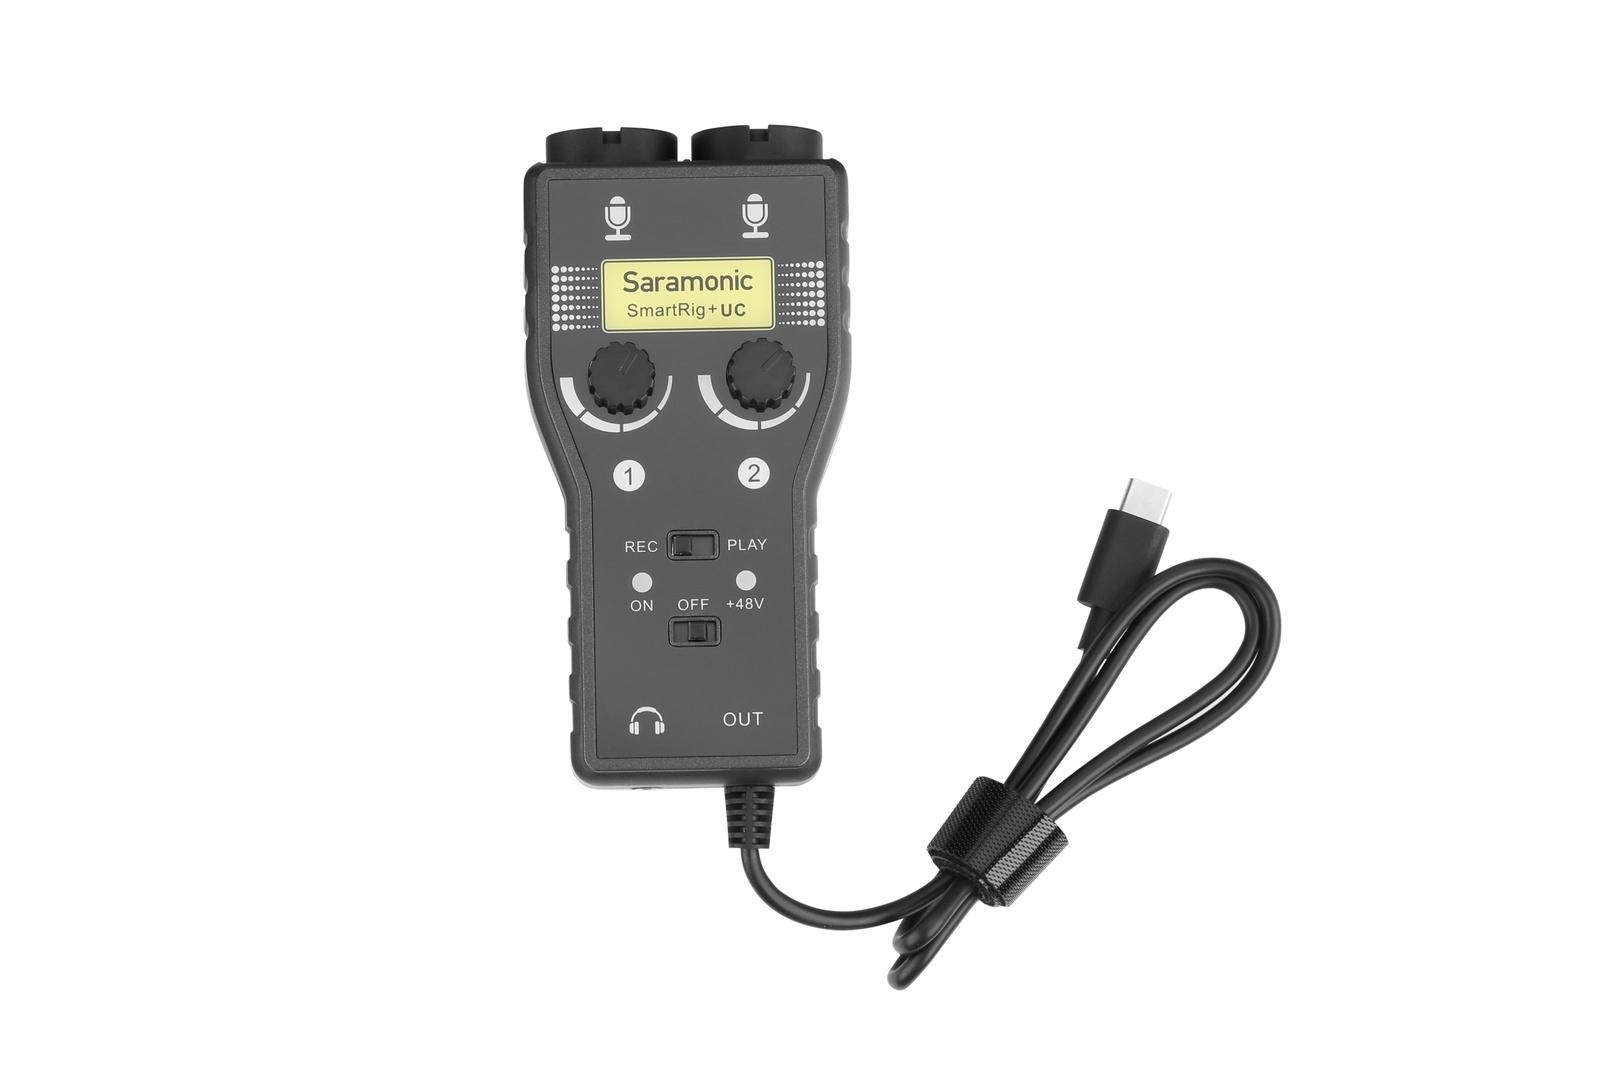 Аксессуар для микрофона Saramonic SmartRig+ UC